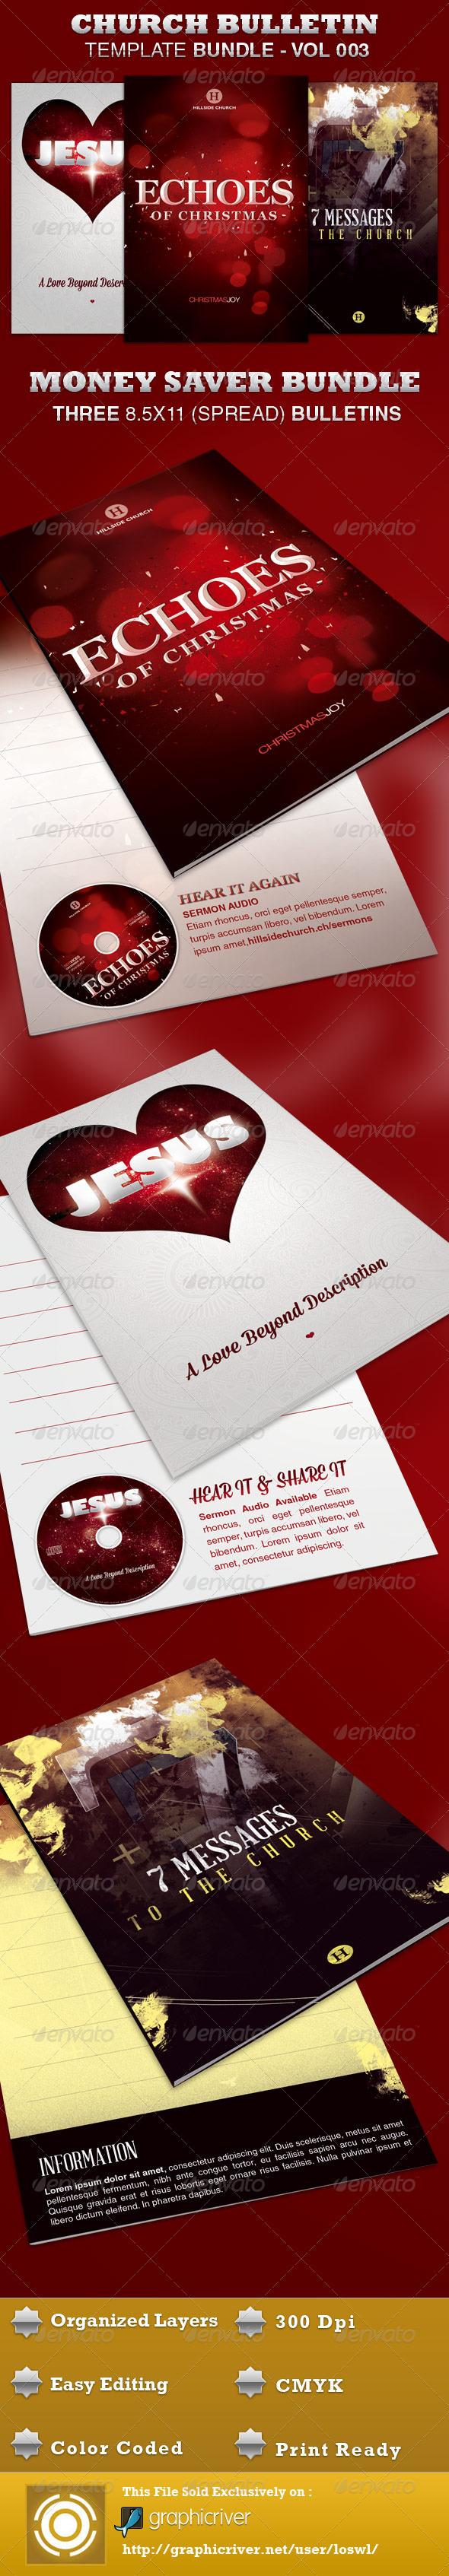 Church Bulletin Template Bundle-Vol 003 - Informational Brochures